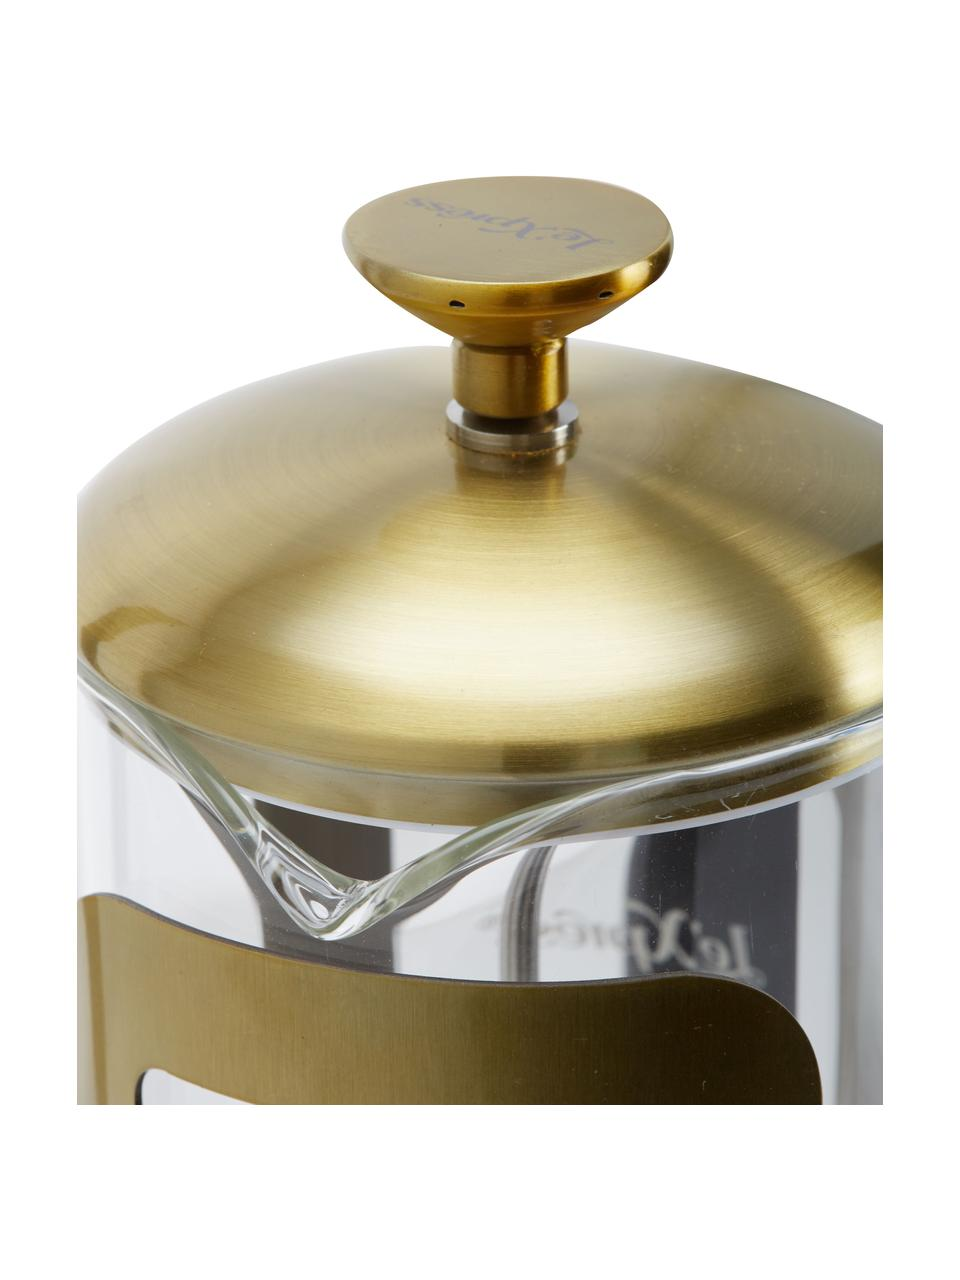 Kaffeebereiter Le'Xpress in Gold/Transparent, Borosilikatglas, Metall, beschichtet, Transparent, Messingfarben, 1 l